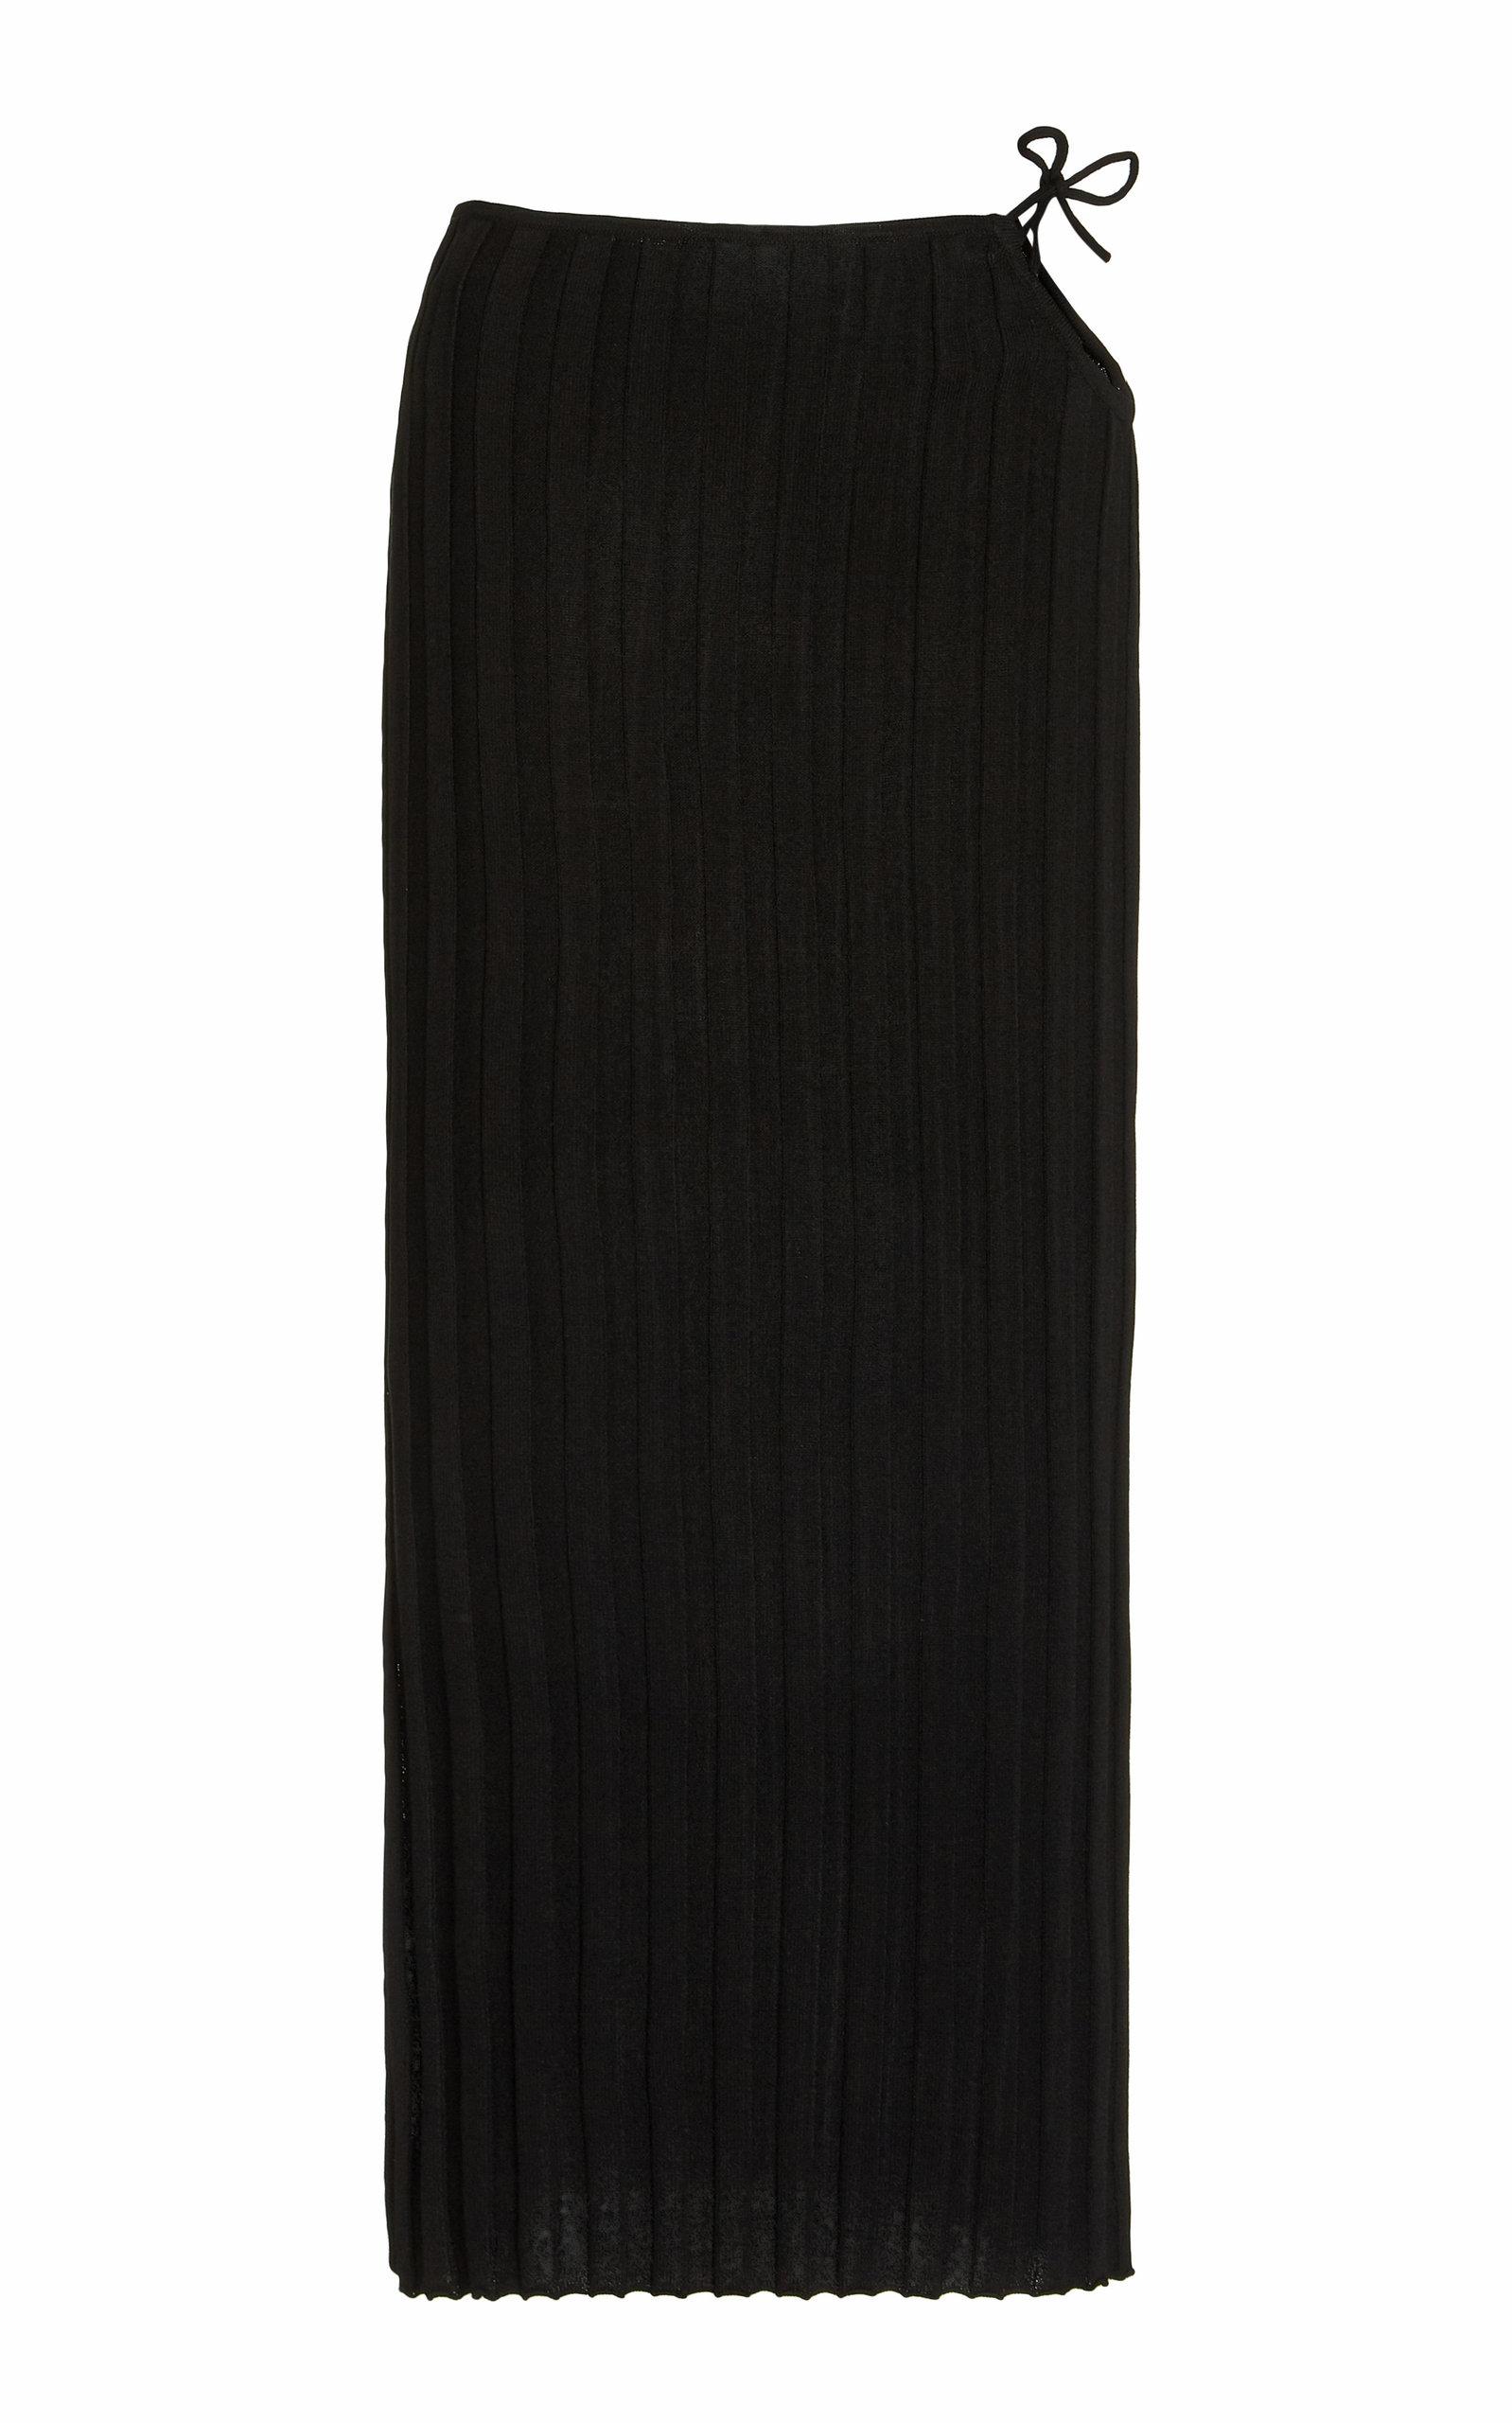 Women's Emerald Cutout Ribbed-Knit Midi Skirt